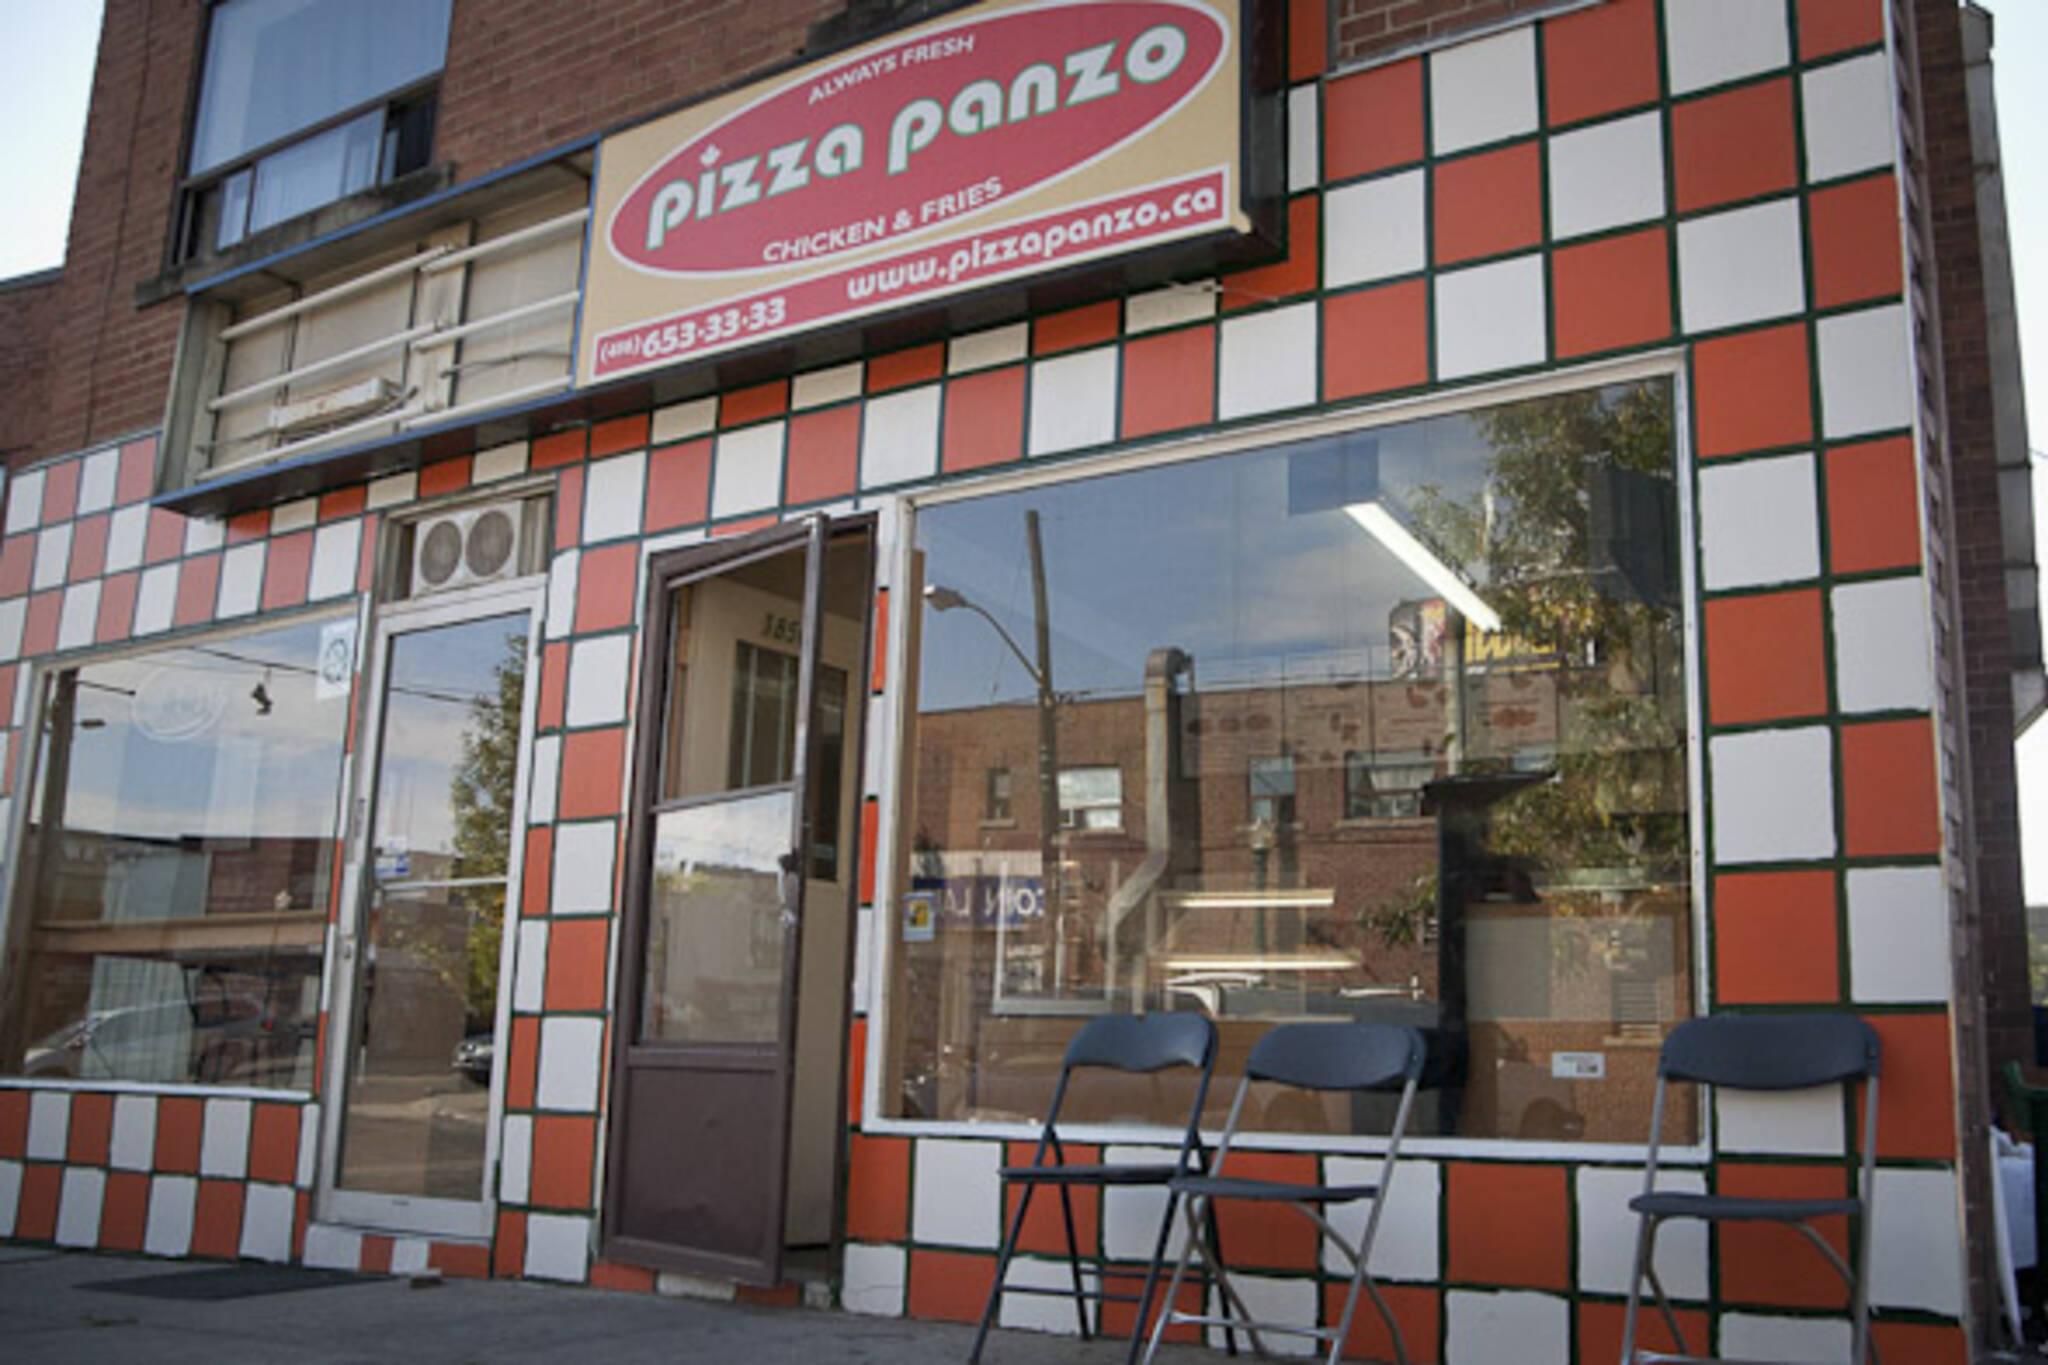 Pizza Panzo